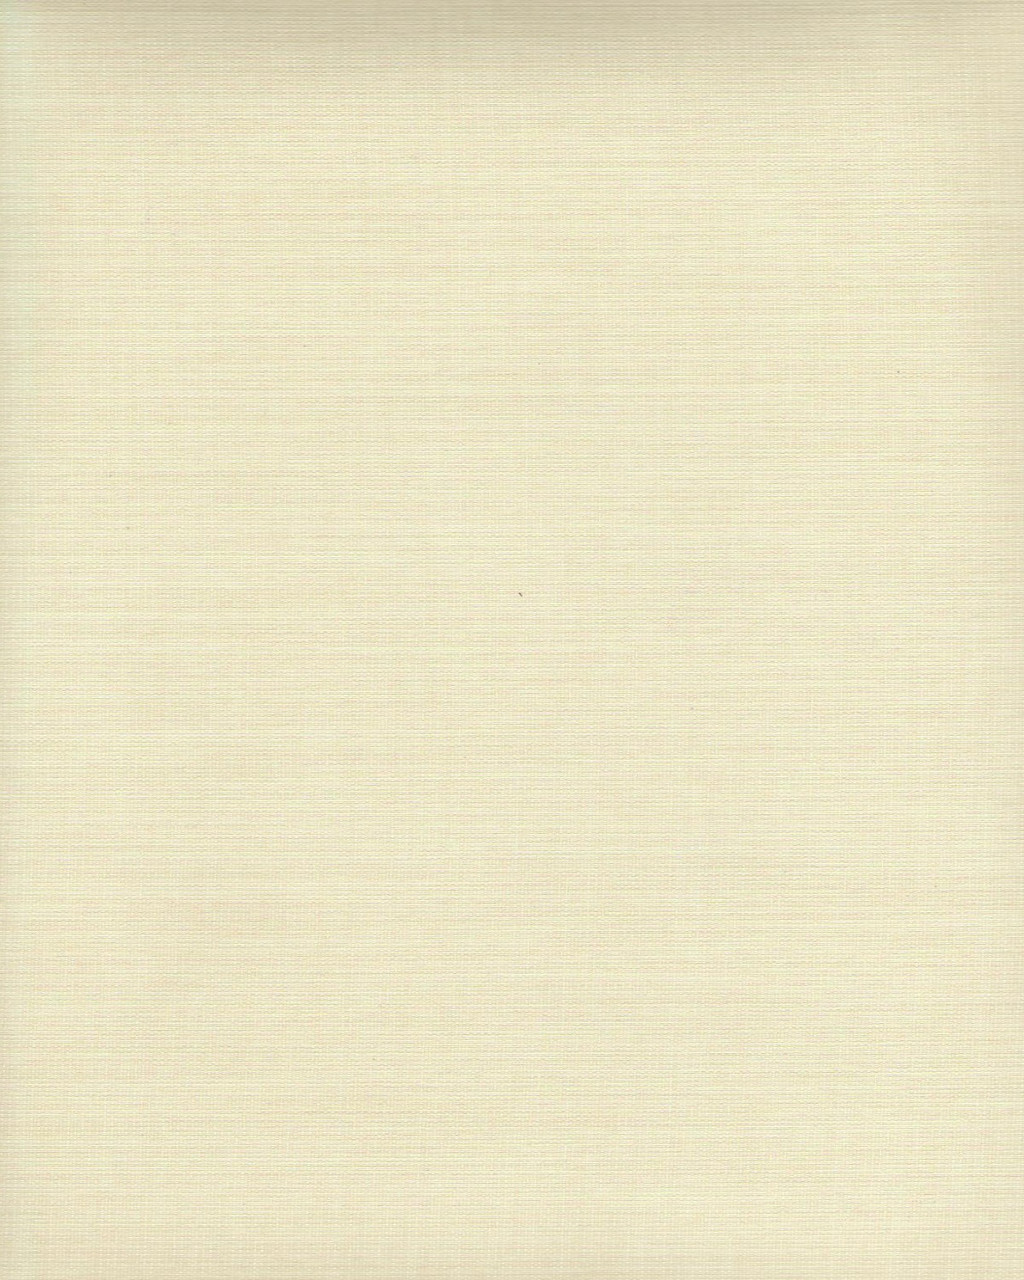 Тканевая ролета Кантри 2020 светло бежевый, 500*1800